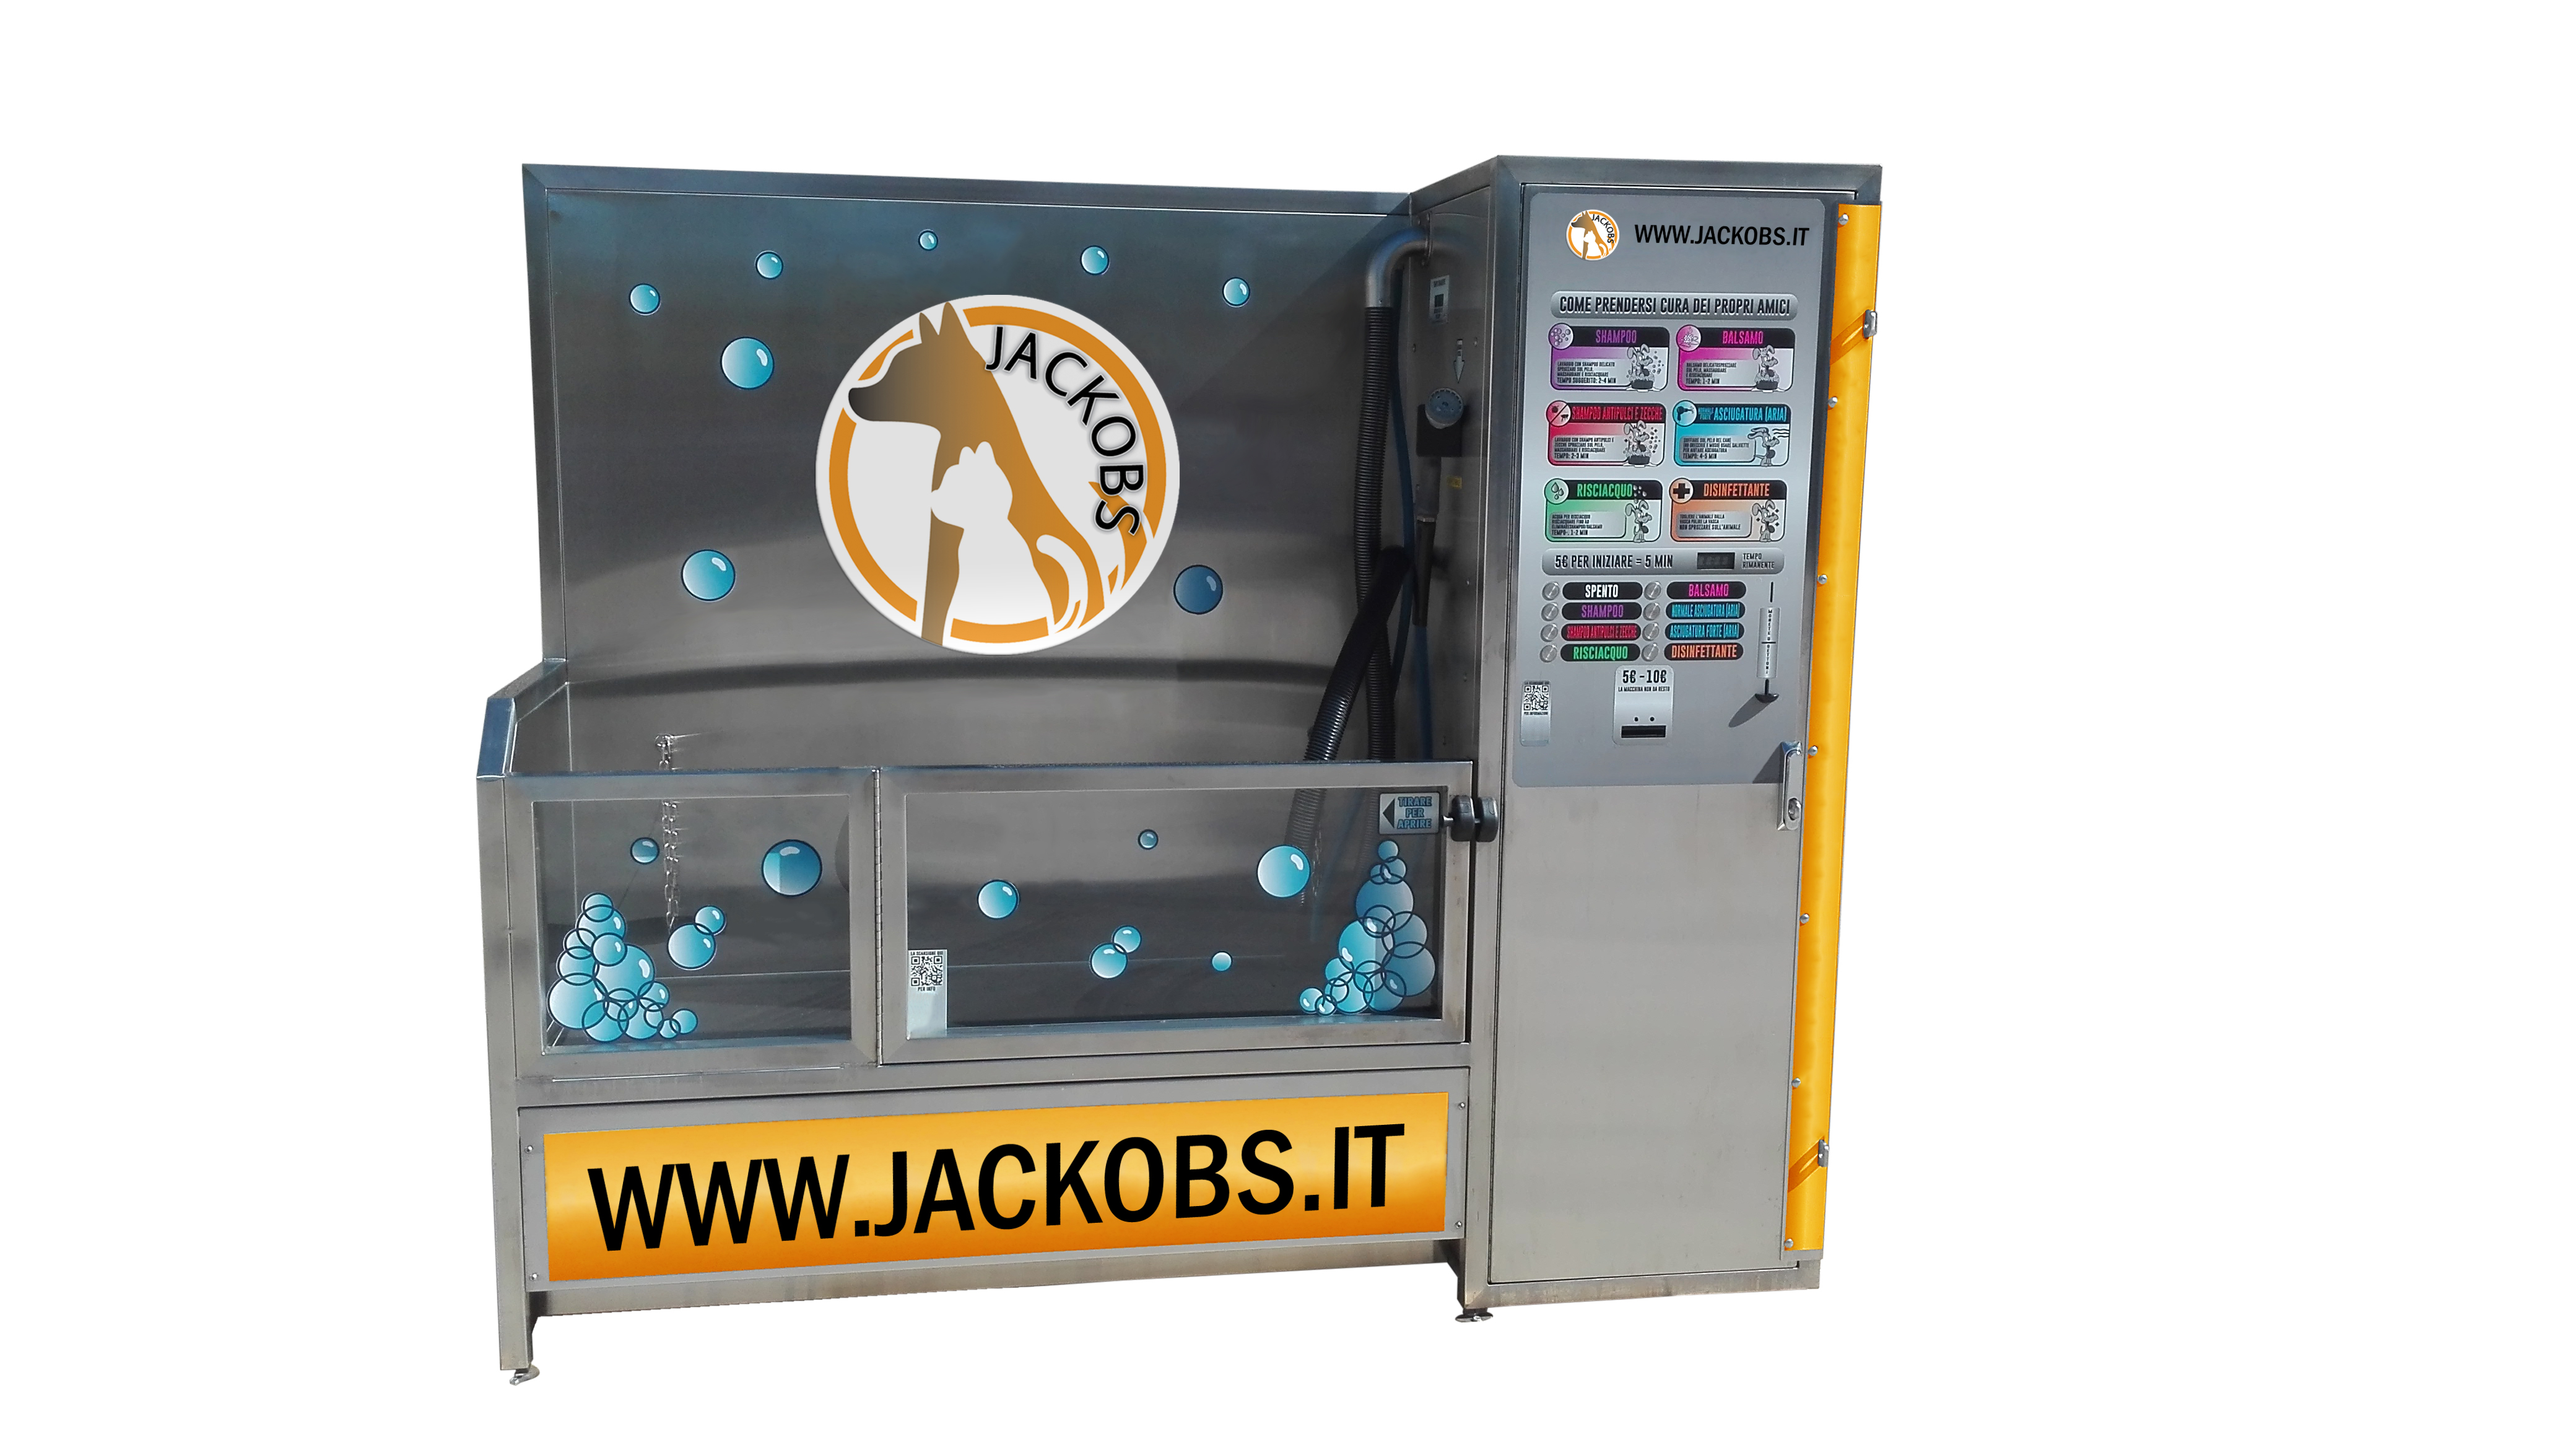 Vasca Da Toelettatura : Prodotti jackobs evolution dog wash lavaggio self service